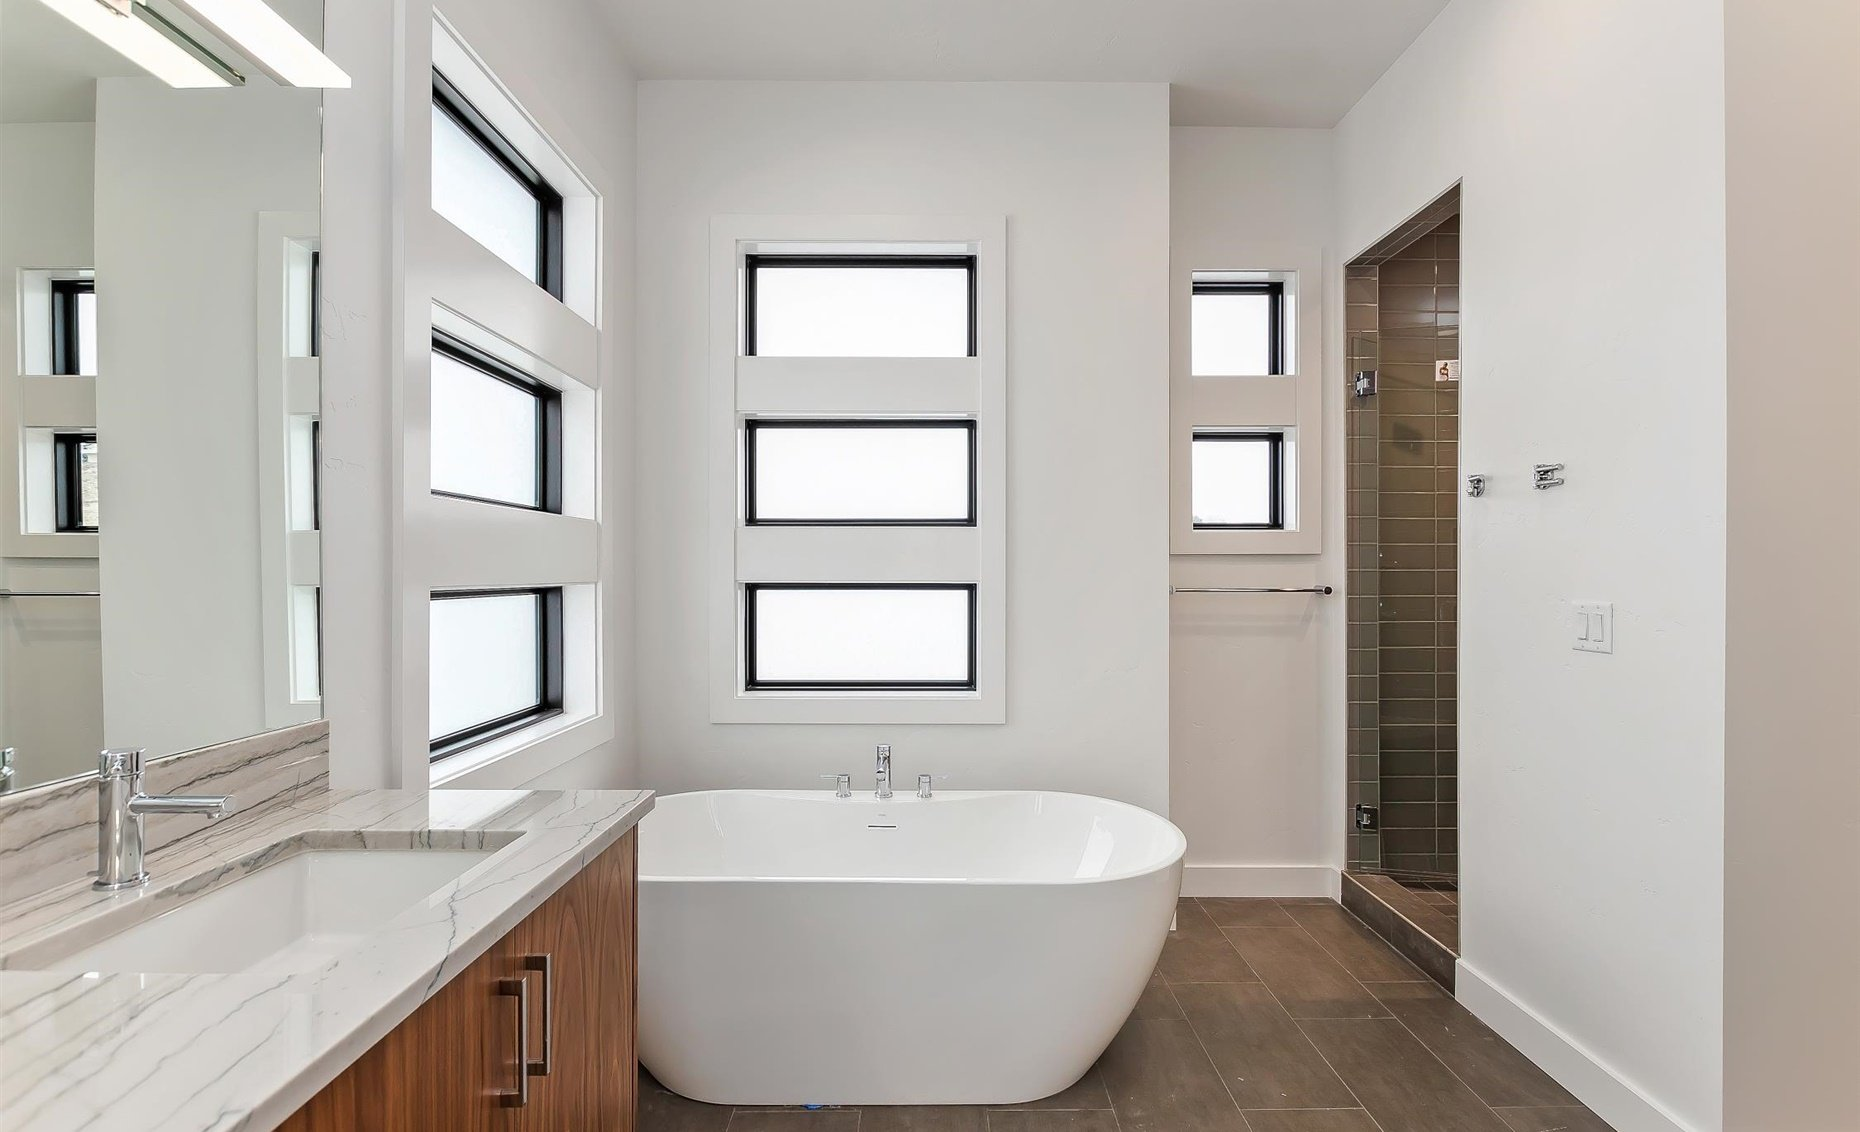 East Highland | Master bathroom shower and bathtub